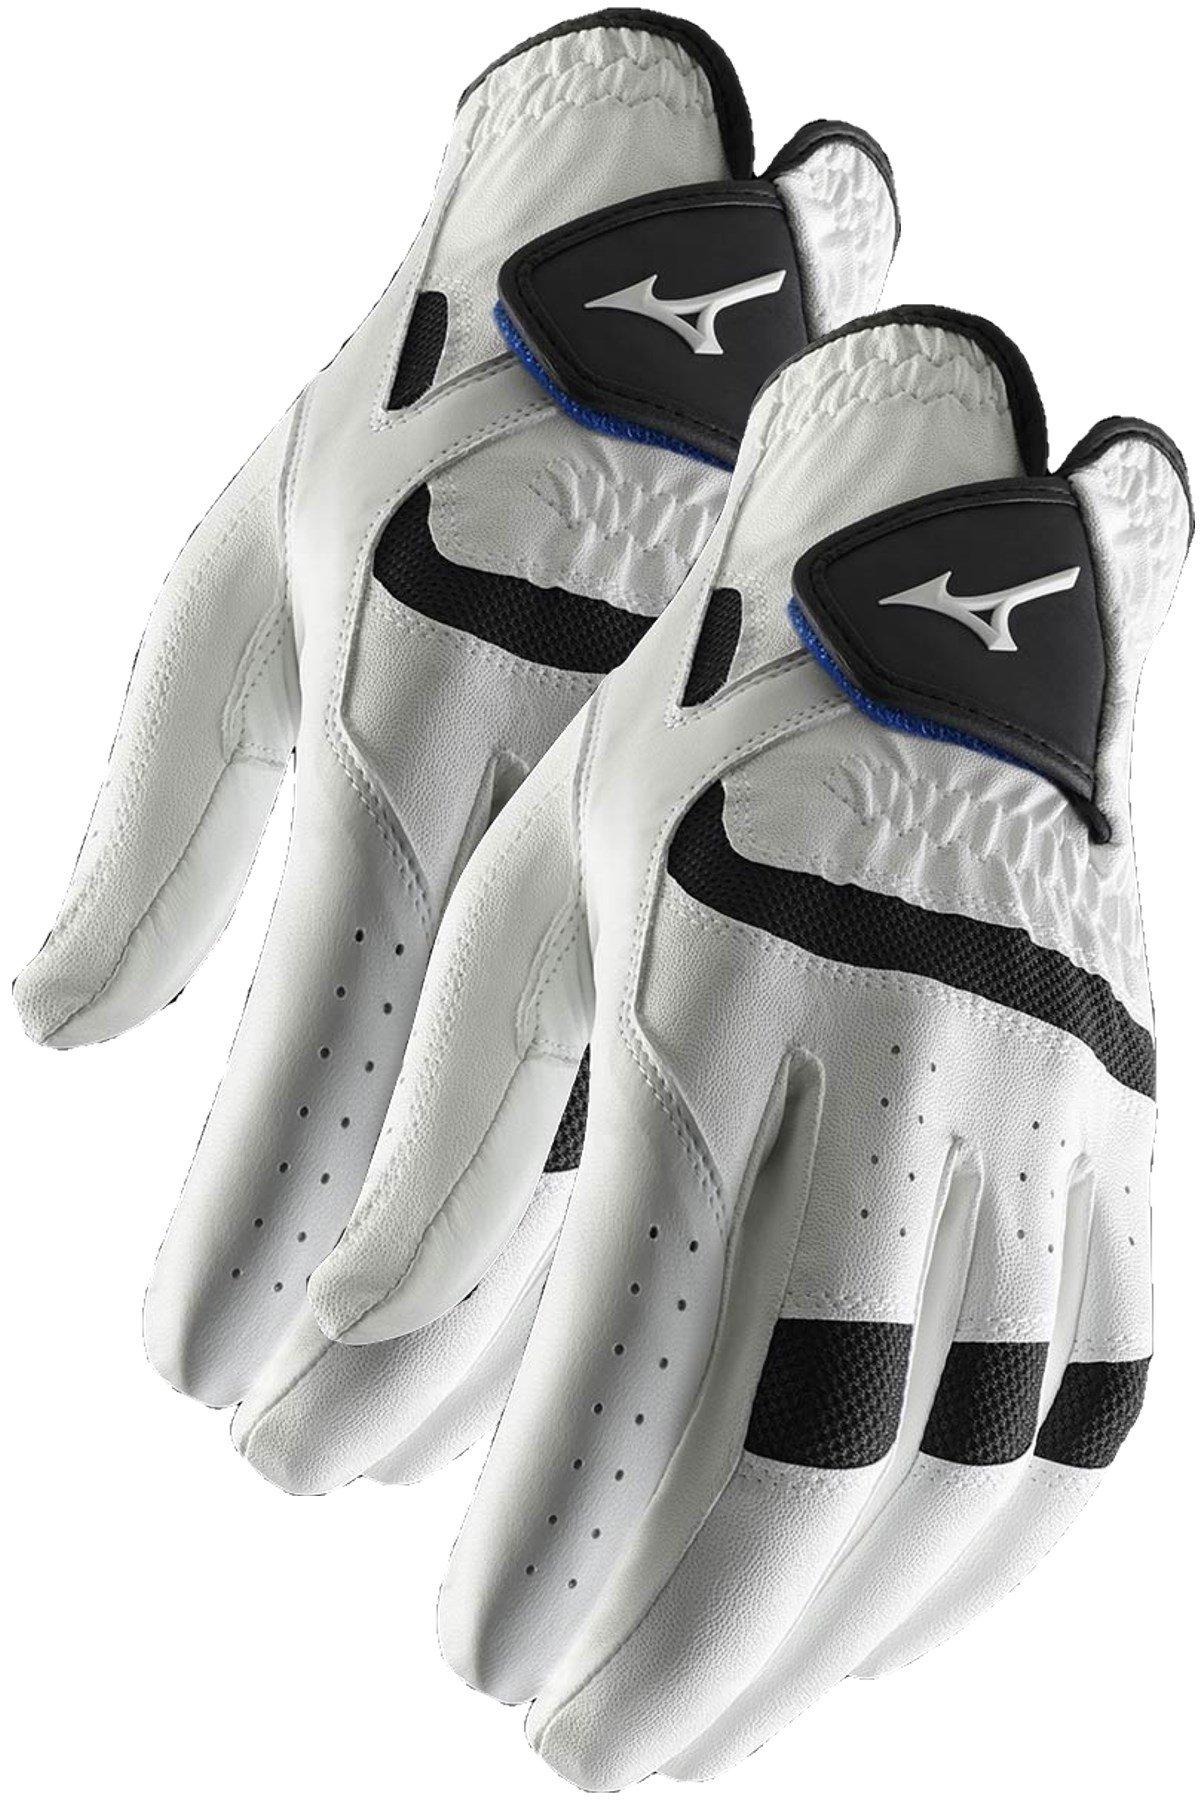 2 NEW Mizuno Elite Mens Golf Gloves Medium Regular Left Hand M 2016